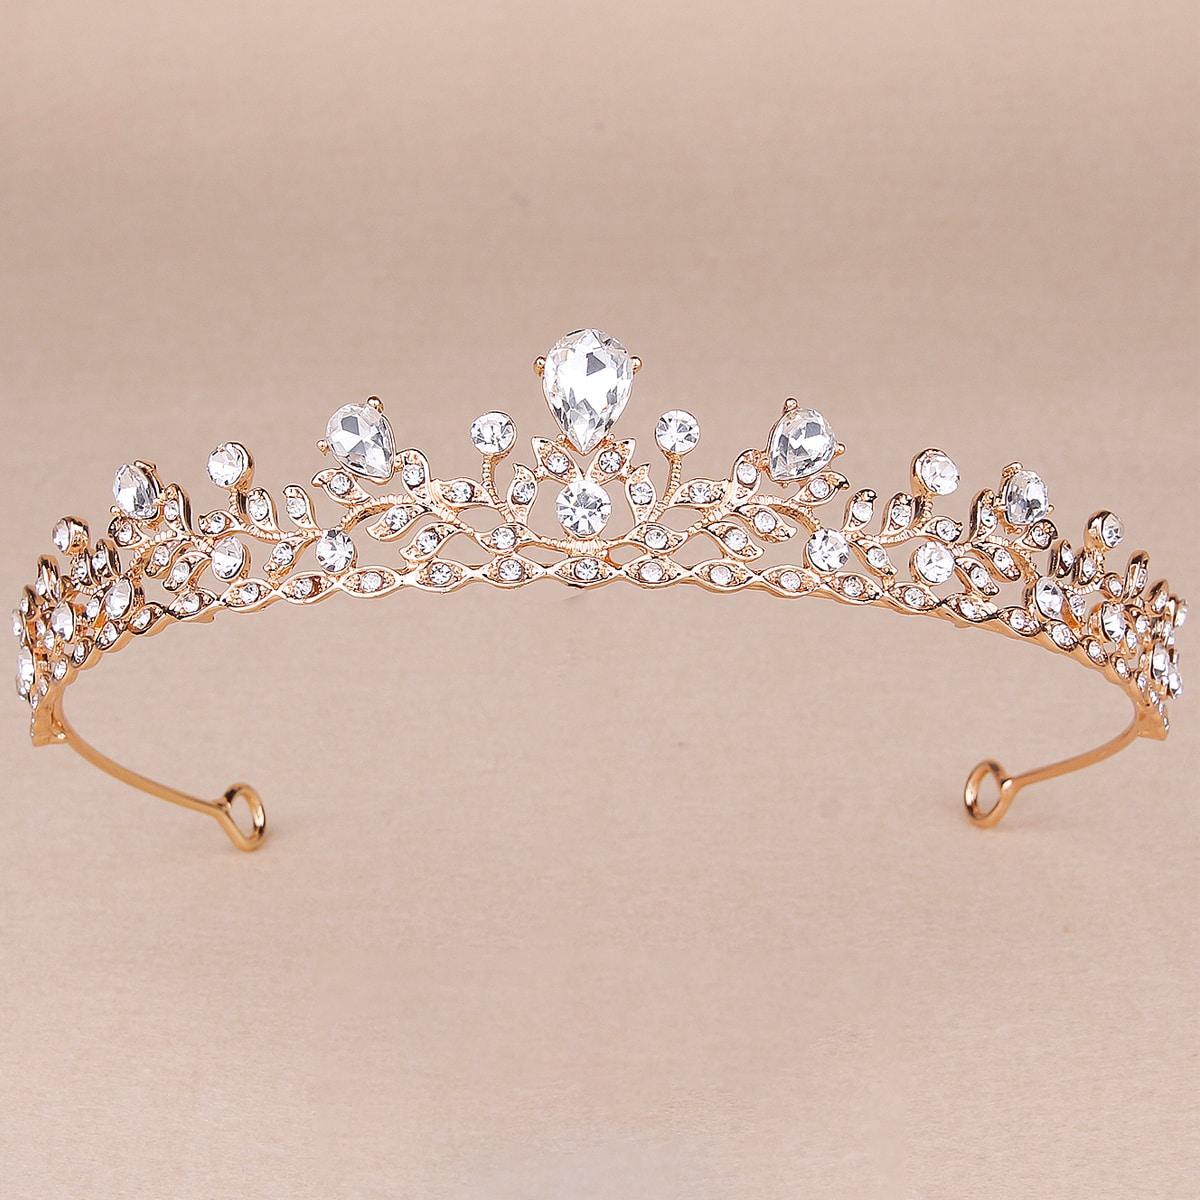 Rhinestone Decor Crown Design Hair Accessory